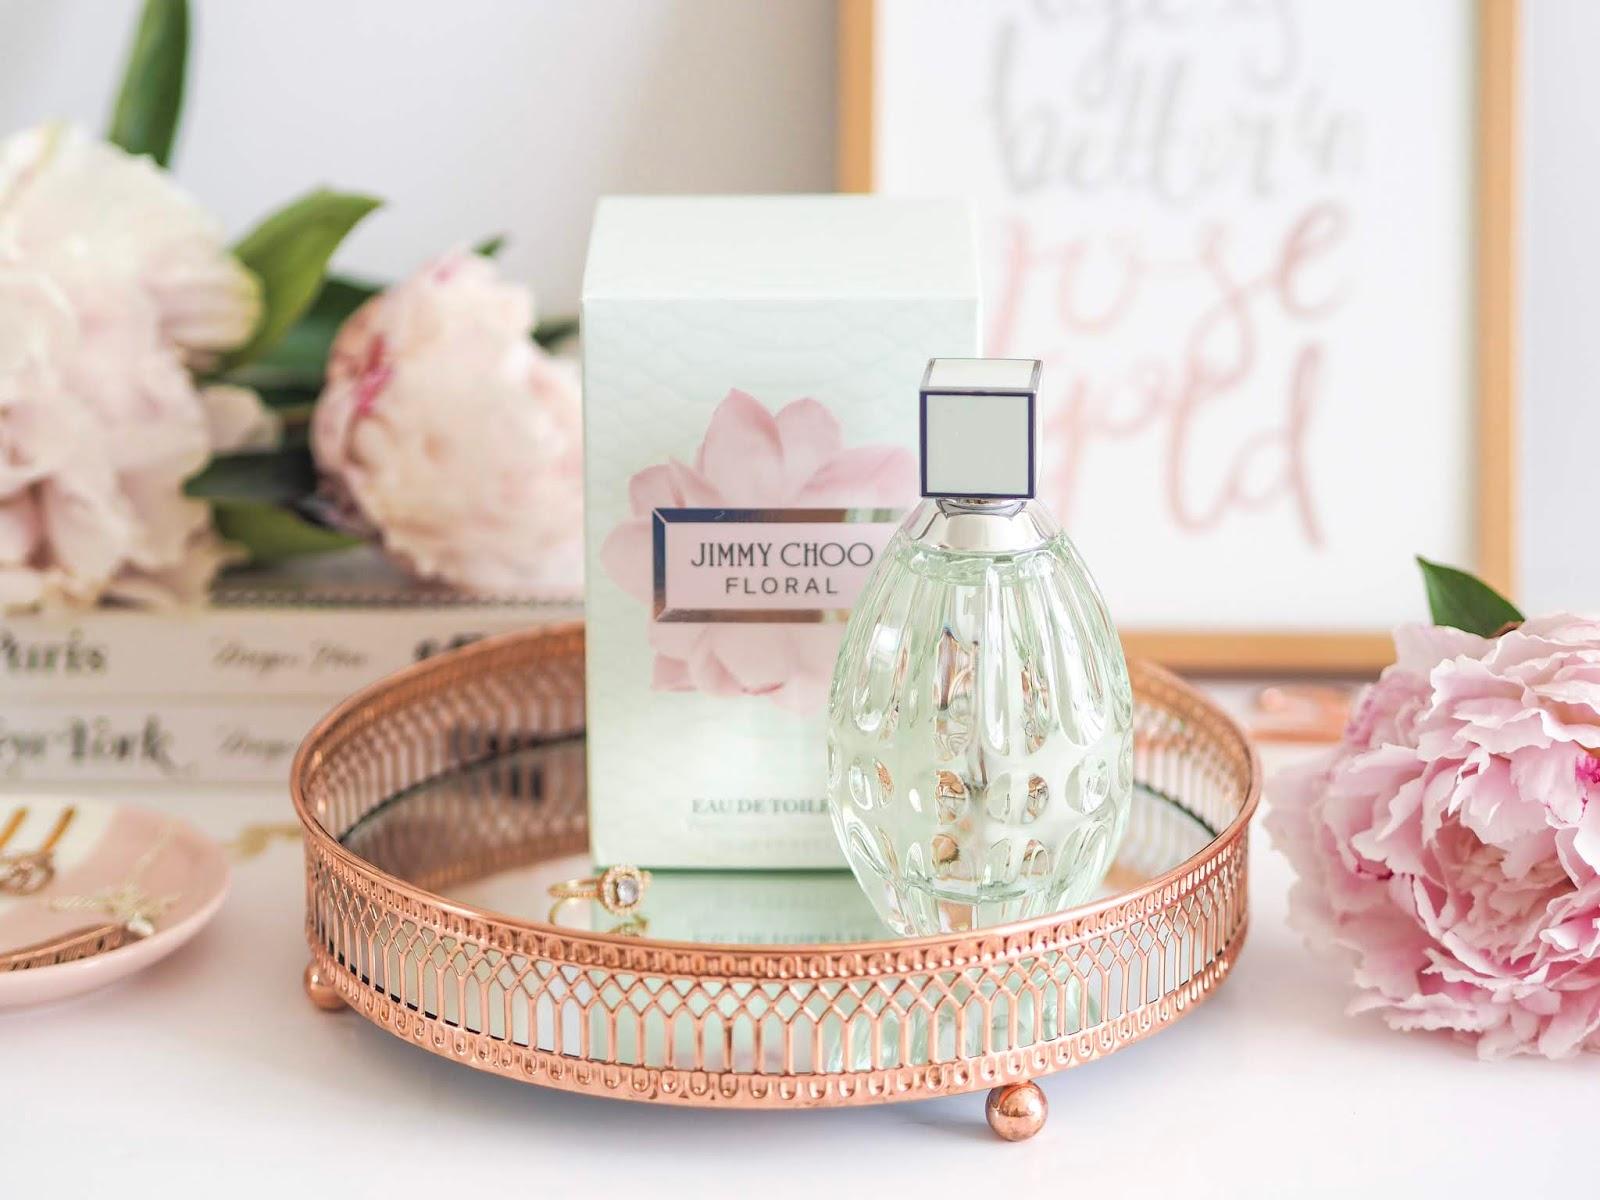 Summer Fragrance Edit: 5 Scents For Summer, Fragrance Direct, Katie Kirk Loves, UK Blogger, Beauty Blogger, Summer Fragrances, Summer Perfumes, Top 5 Fragrances